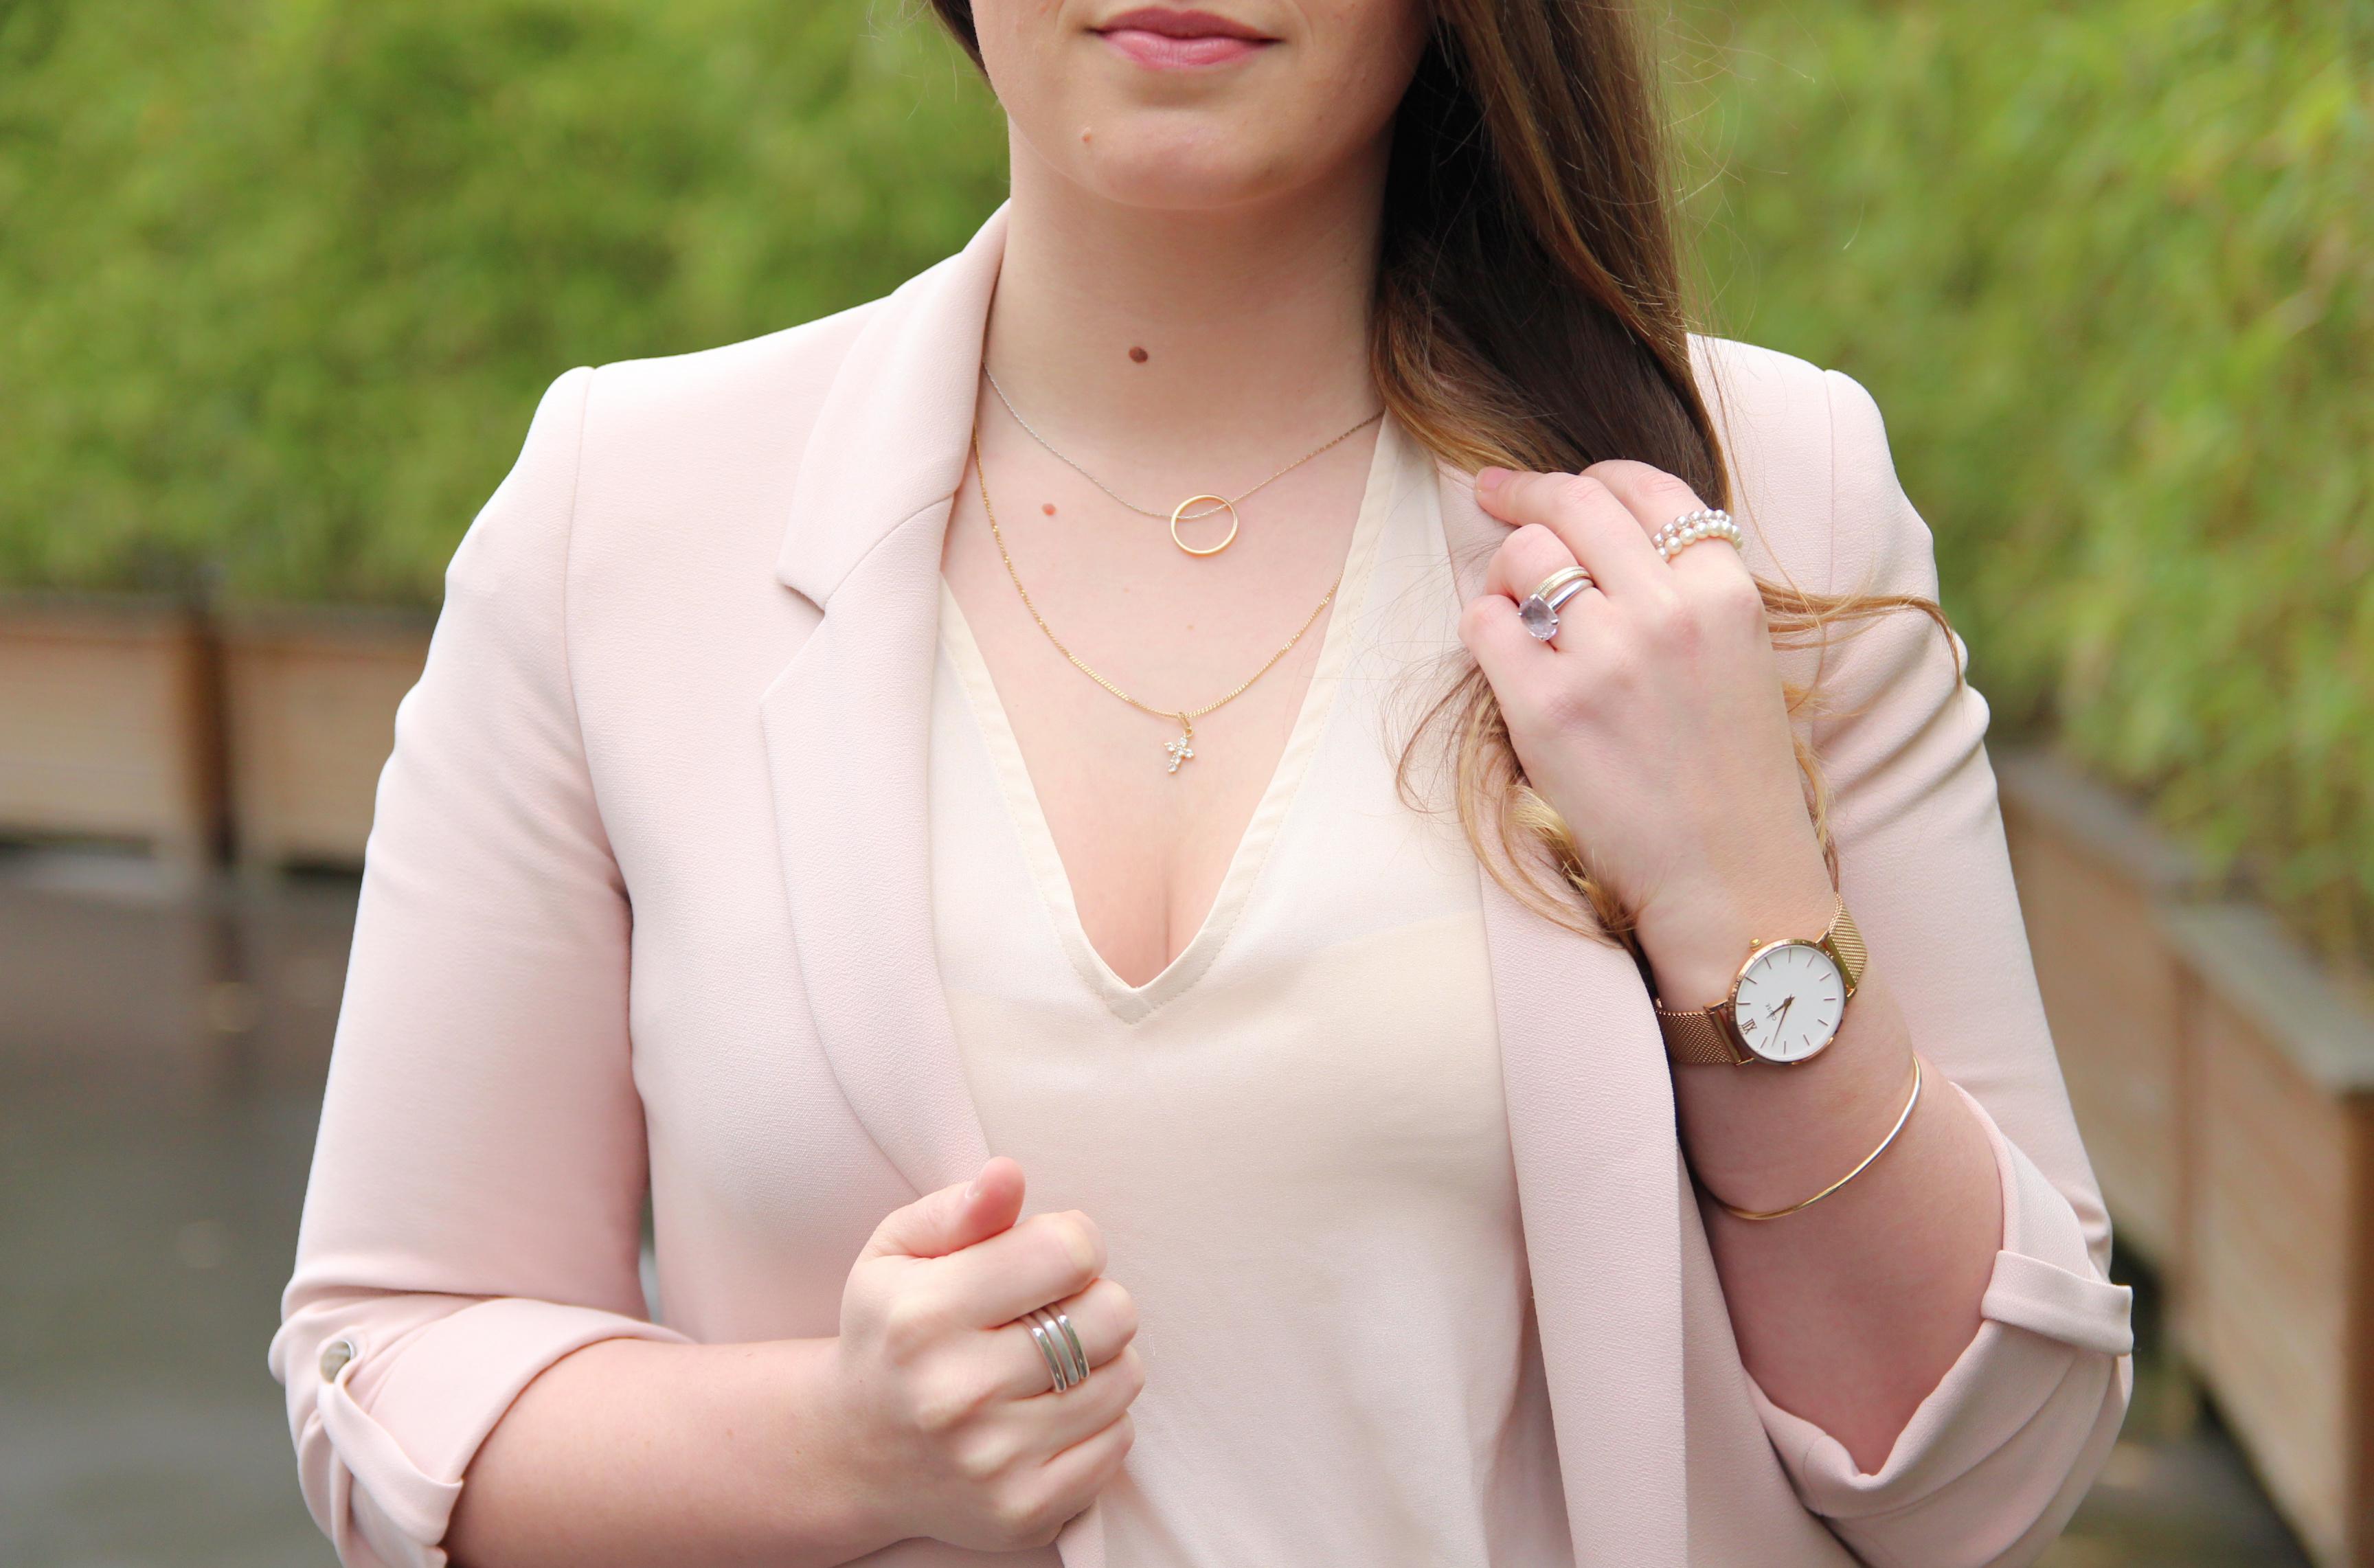 fashionblogger-influencer-jacket-zara-rosepastel-paris-seralynepointcom-2017-03-21 115938